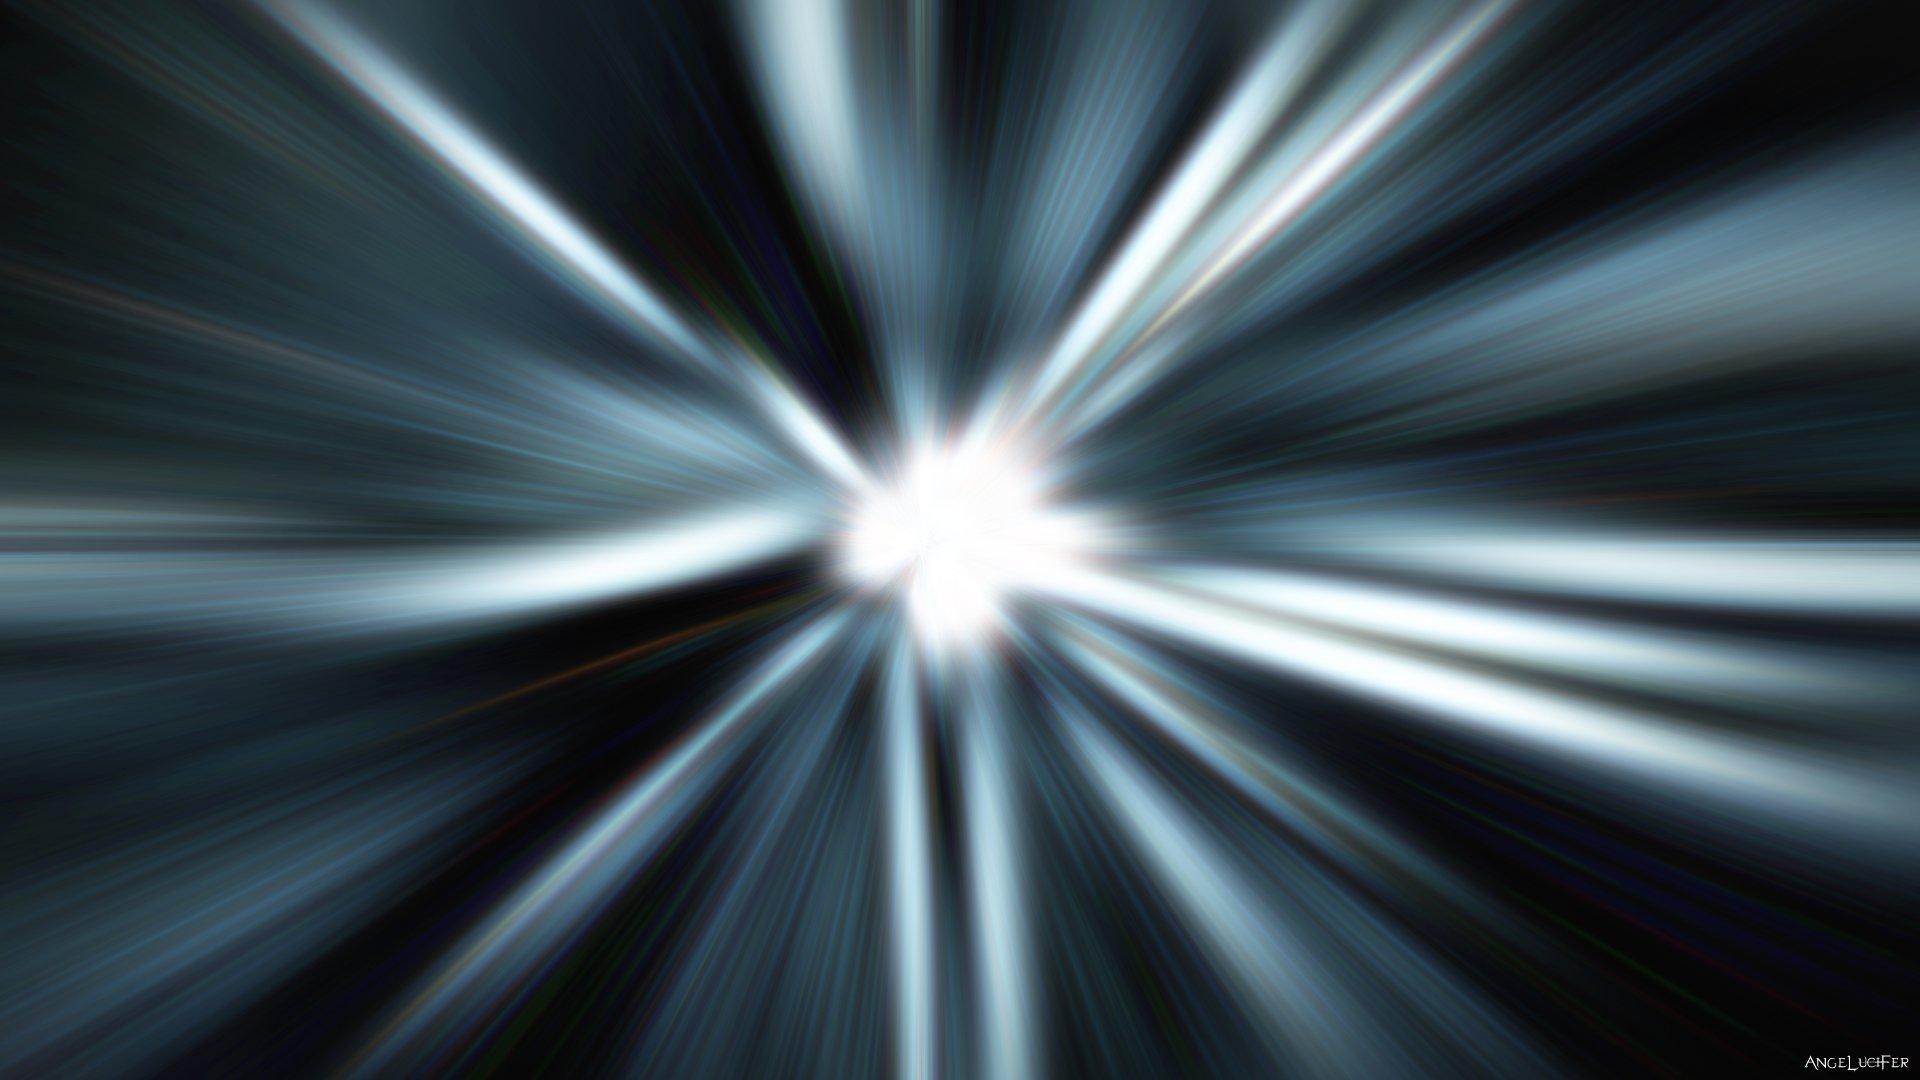 screen radial image